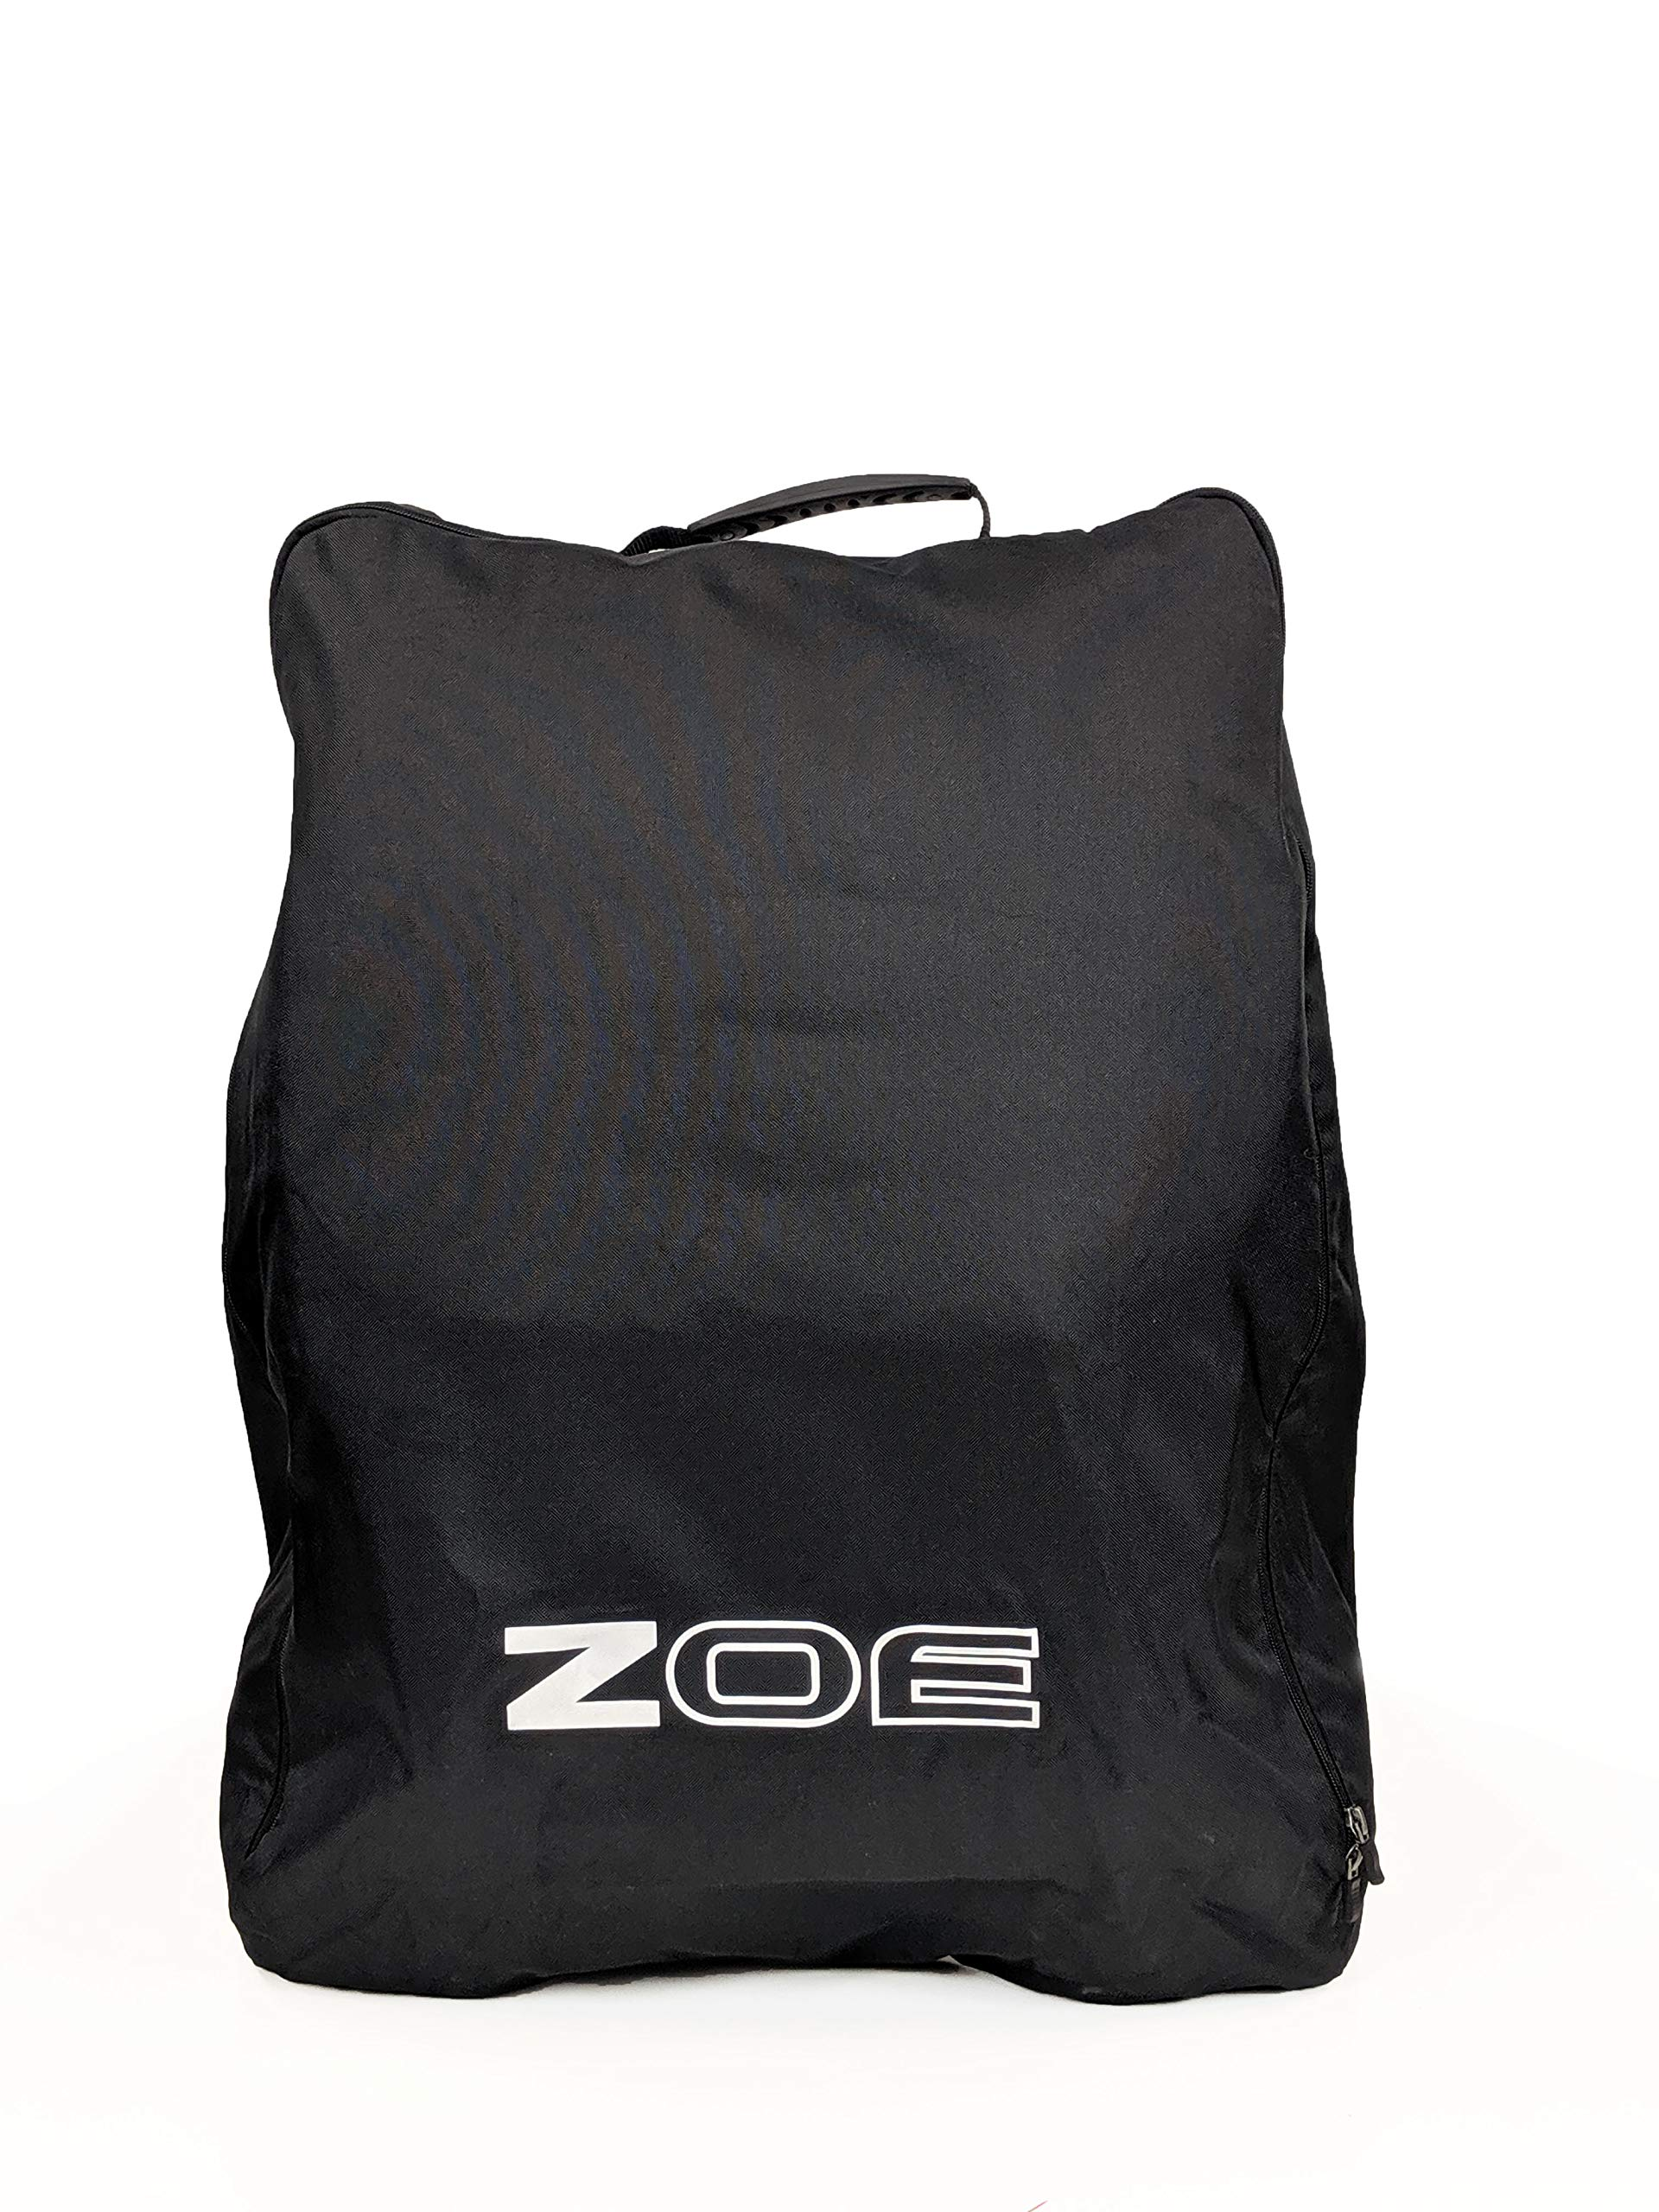 ZOE Stroller Travel Backpack & Storage Bag (XL1) by ZOE (Image #1)